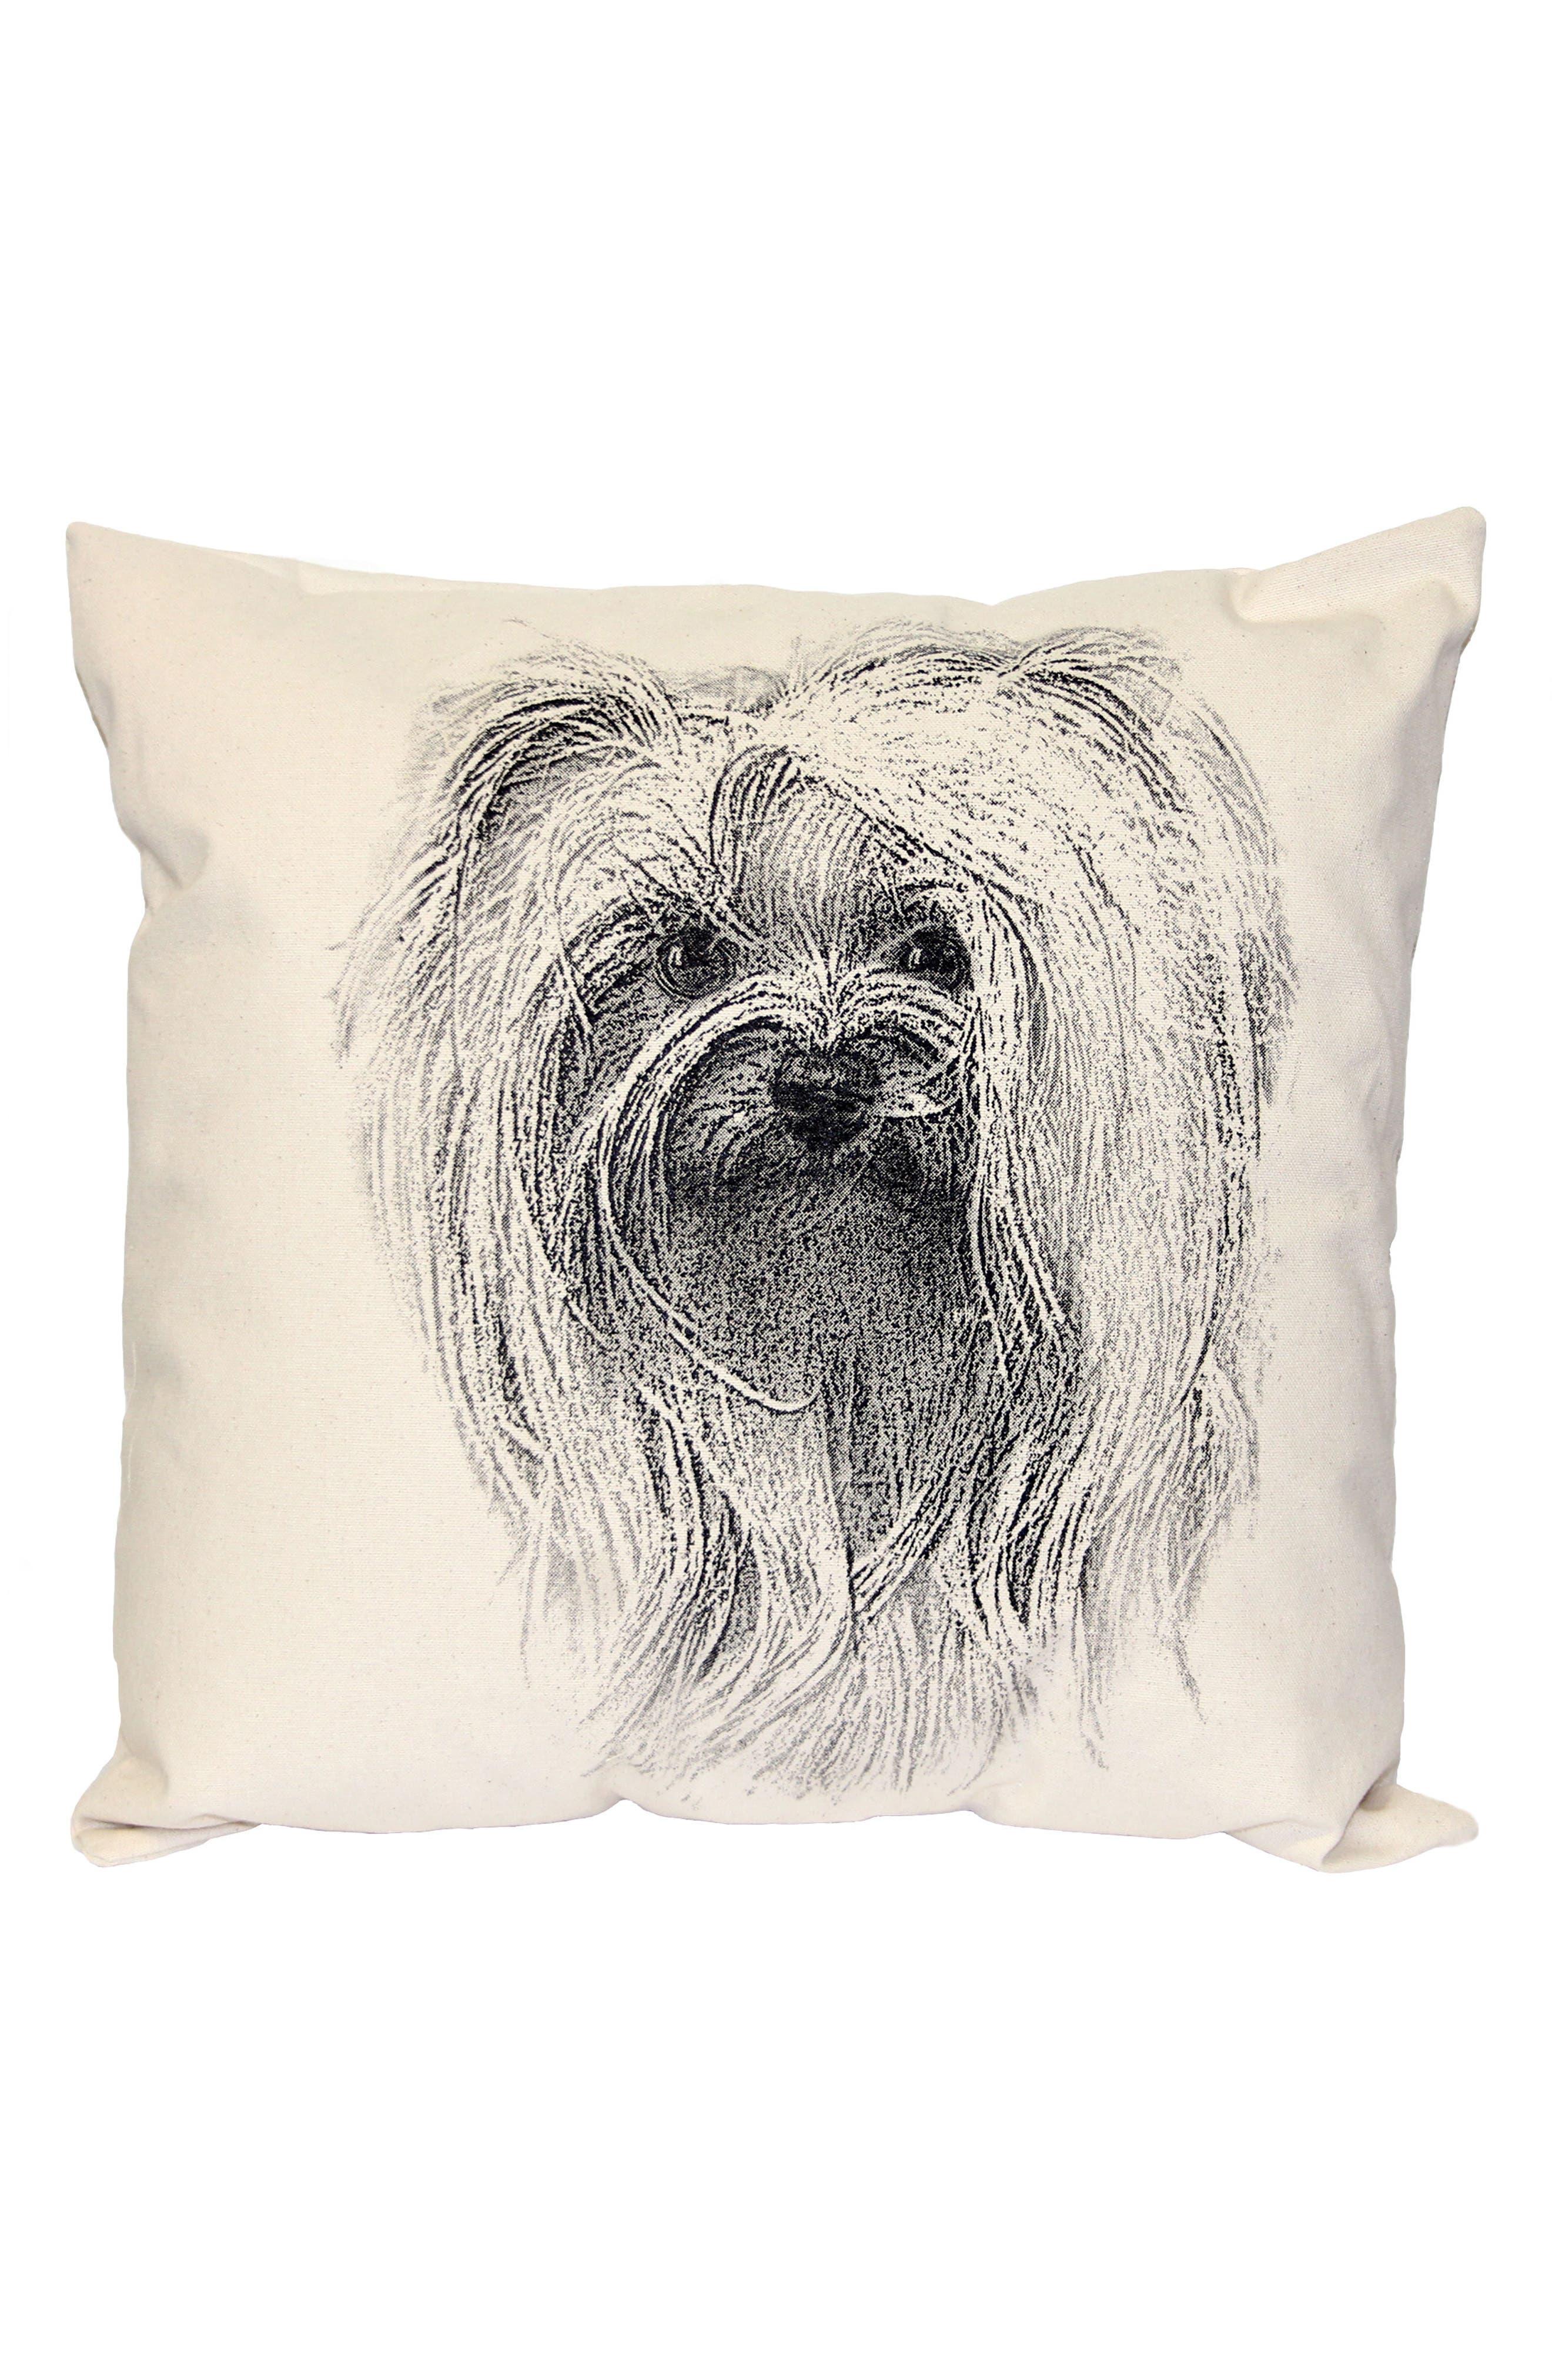 Animal Accent Pillow,                             Main thumbnail 6, color,